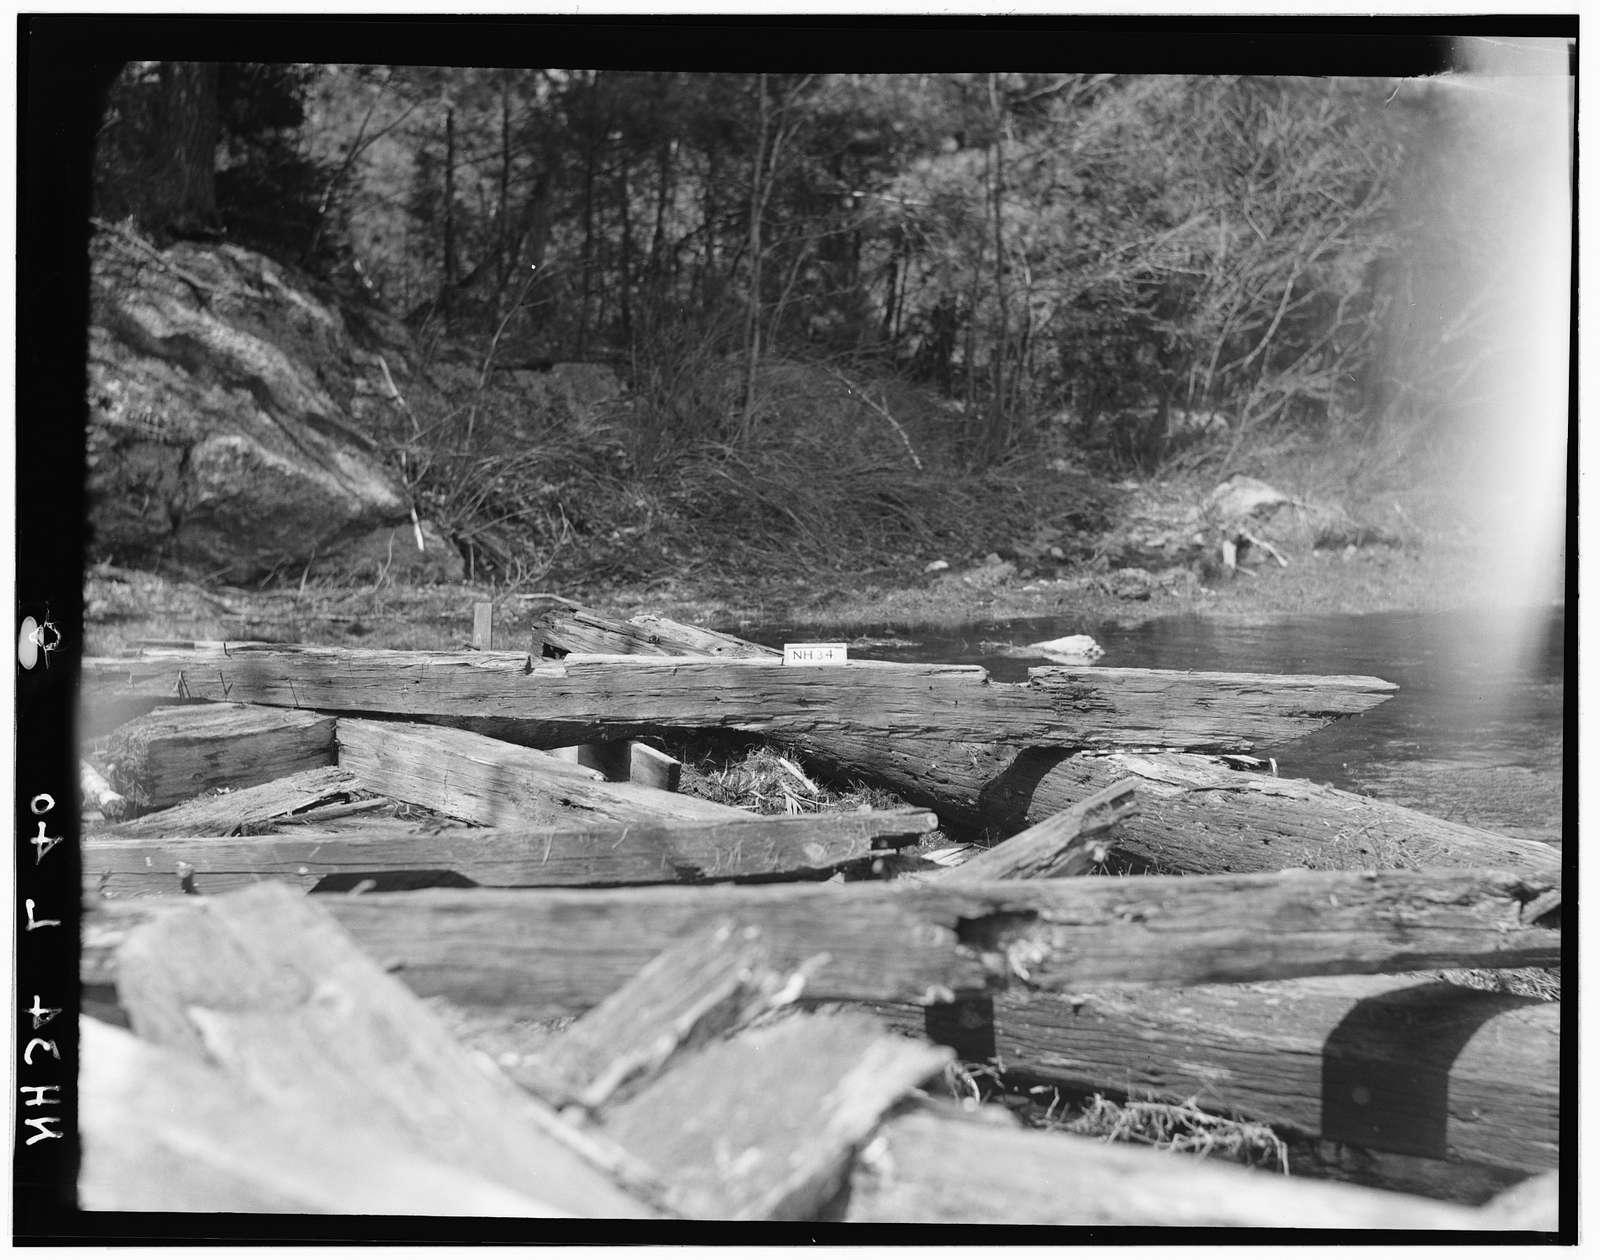 James Saw Mill, Narrows Brook, Northwood Narrows, Rockingham County, NH